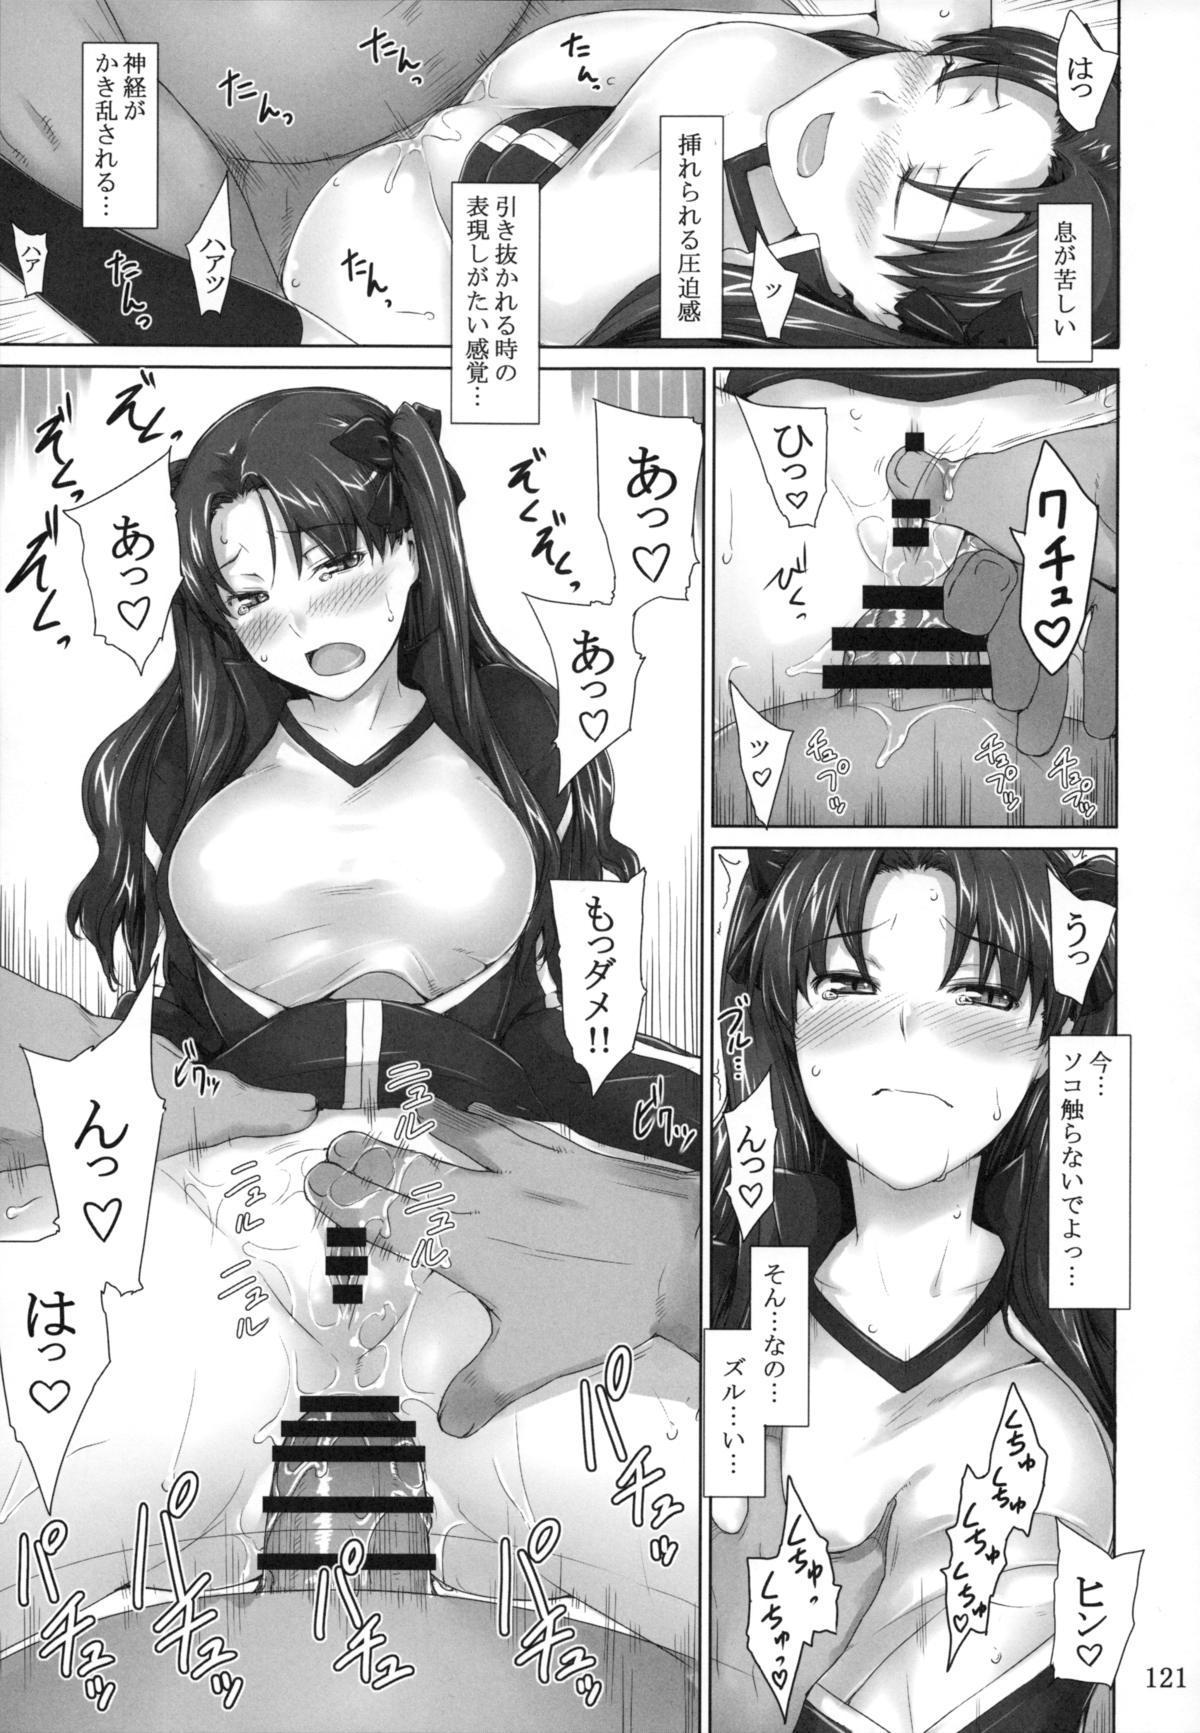 Tosaka-ke no Kakei Jijou Soushuuhen 1 120